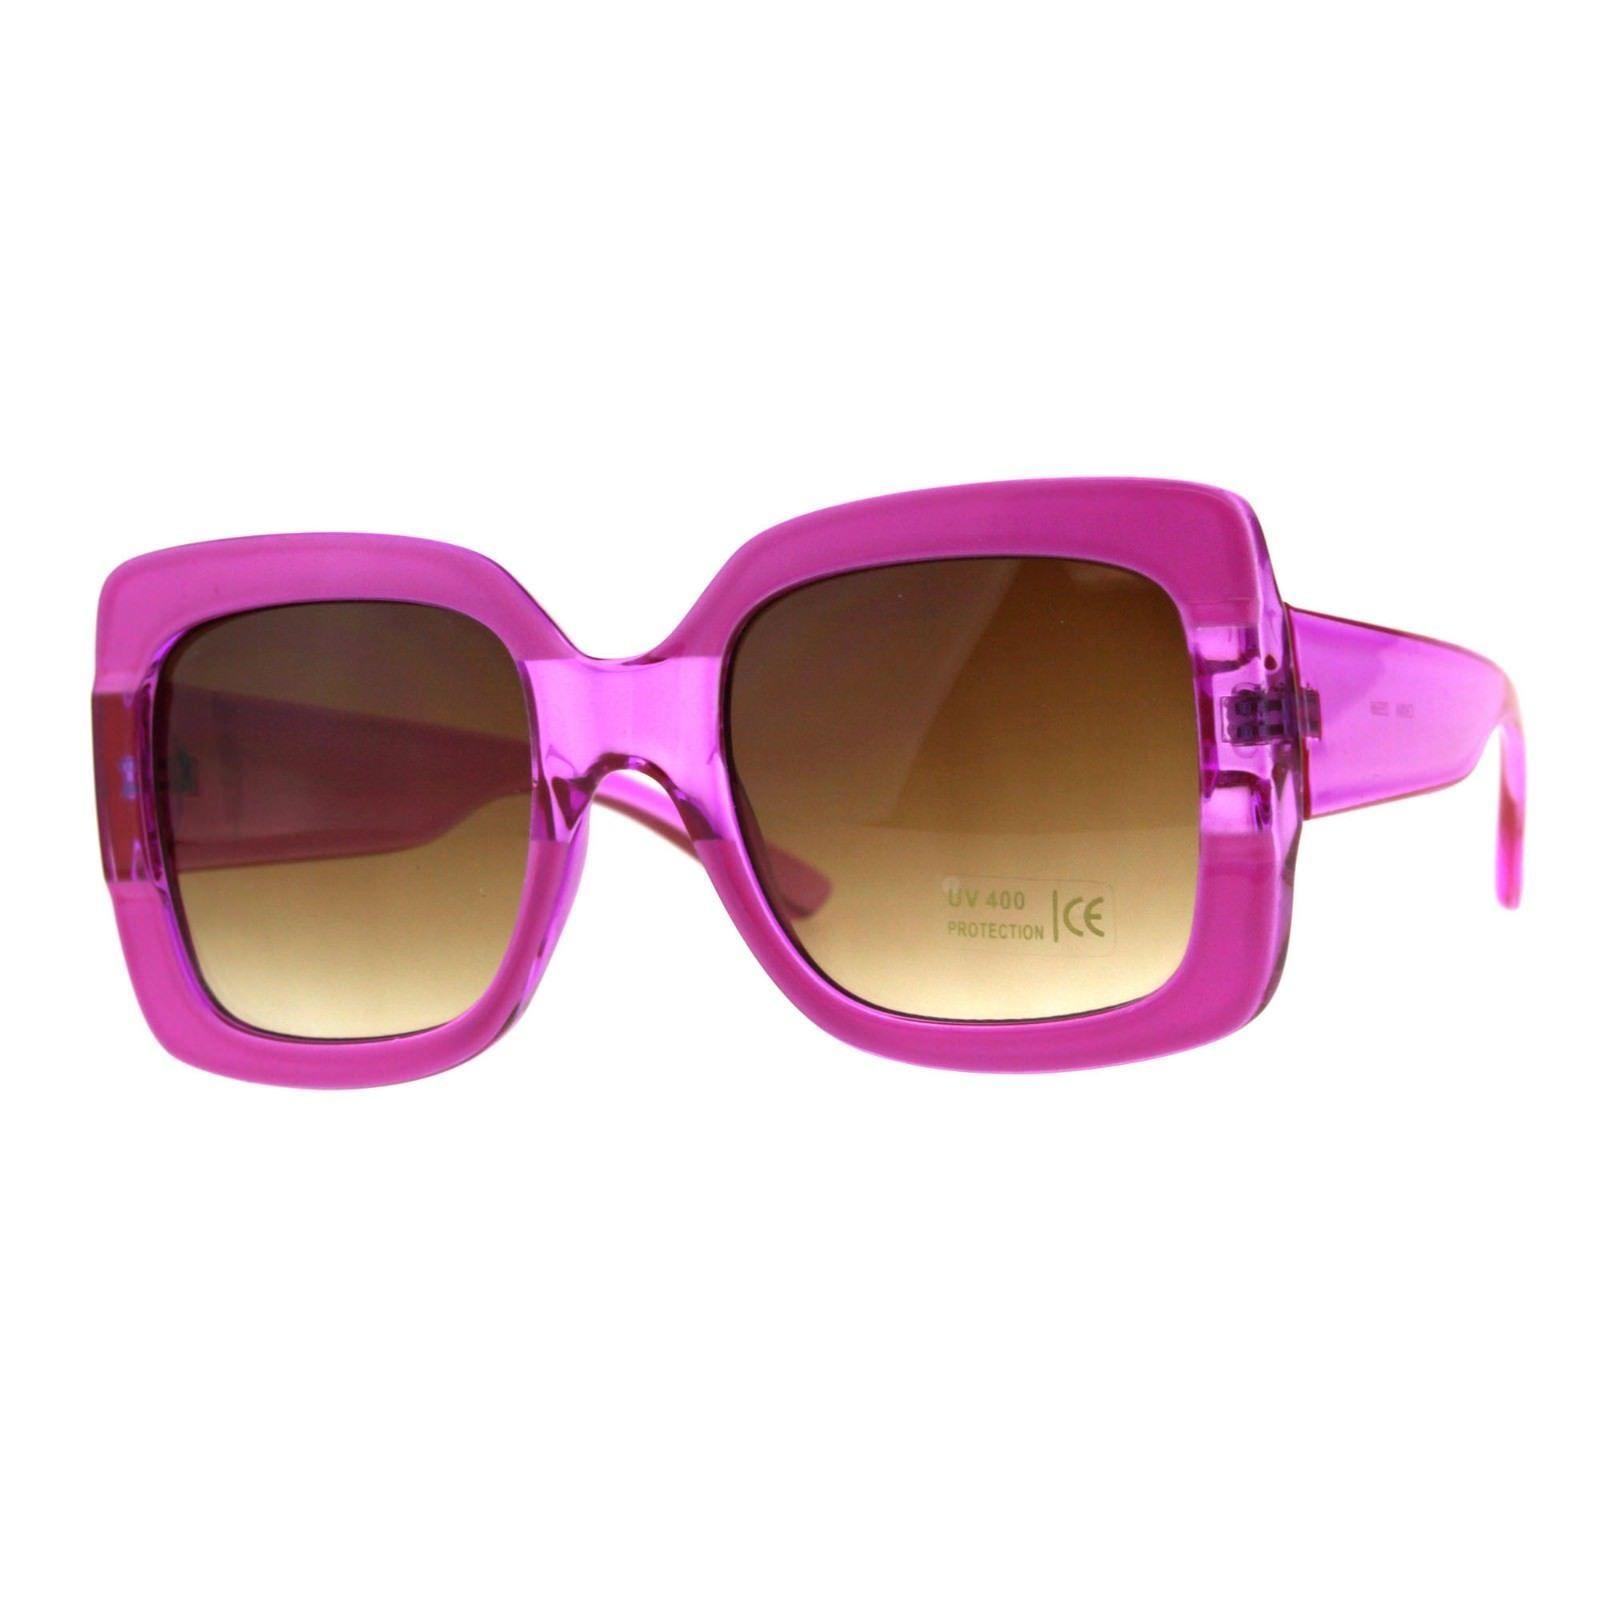 Womens Square Frame Sunglasses Oversized Fashion Shades UV 400